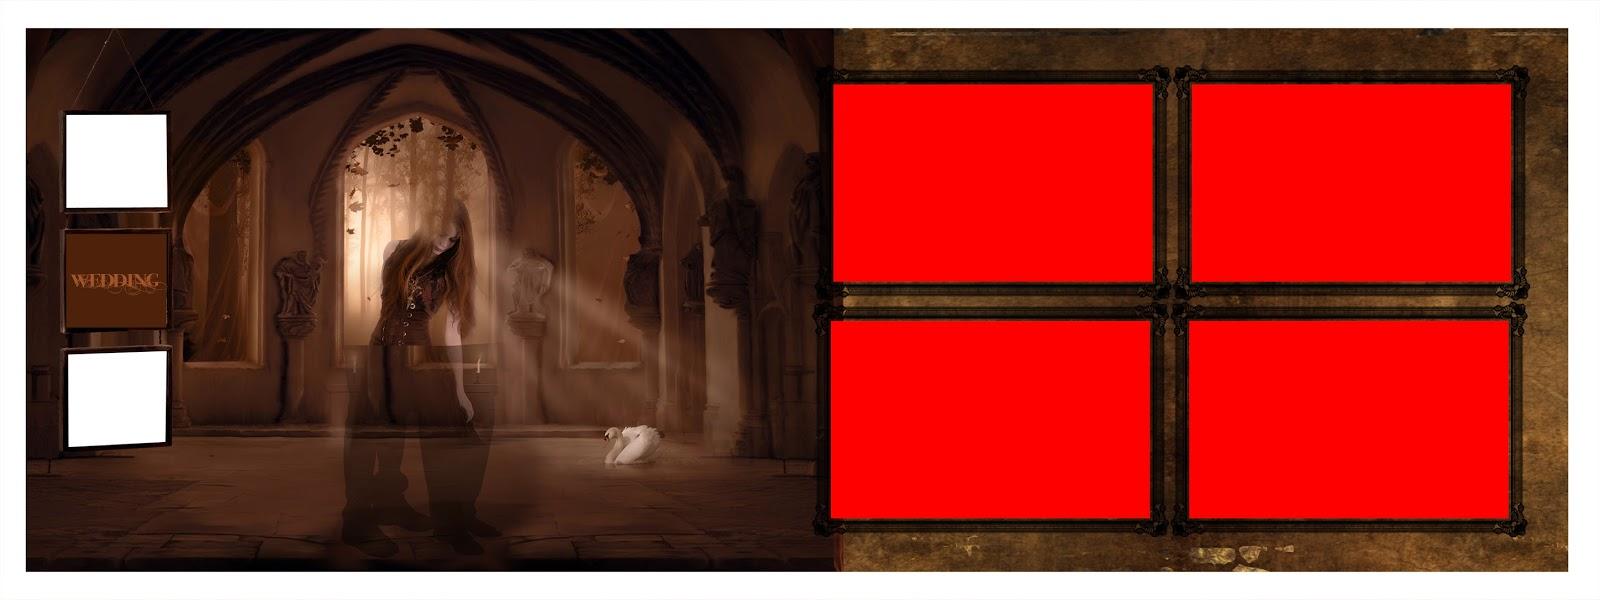 Karizma Album Design 12x36 Psd Wedding Background Free Download Naveengfx